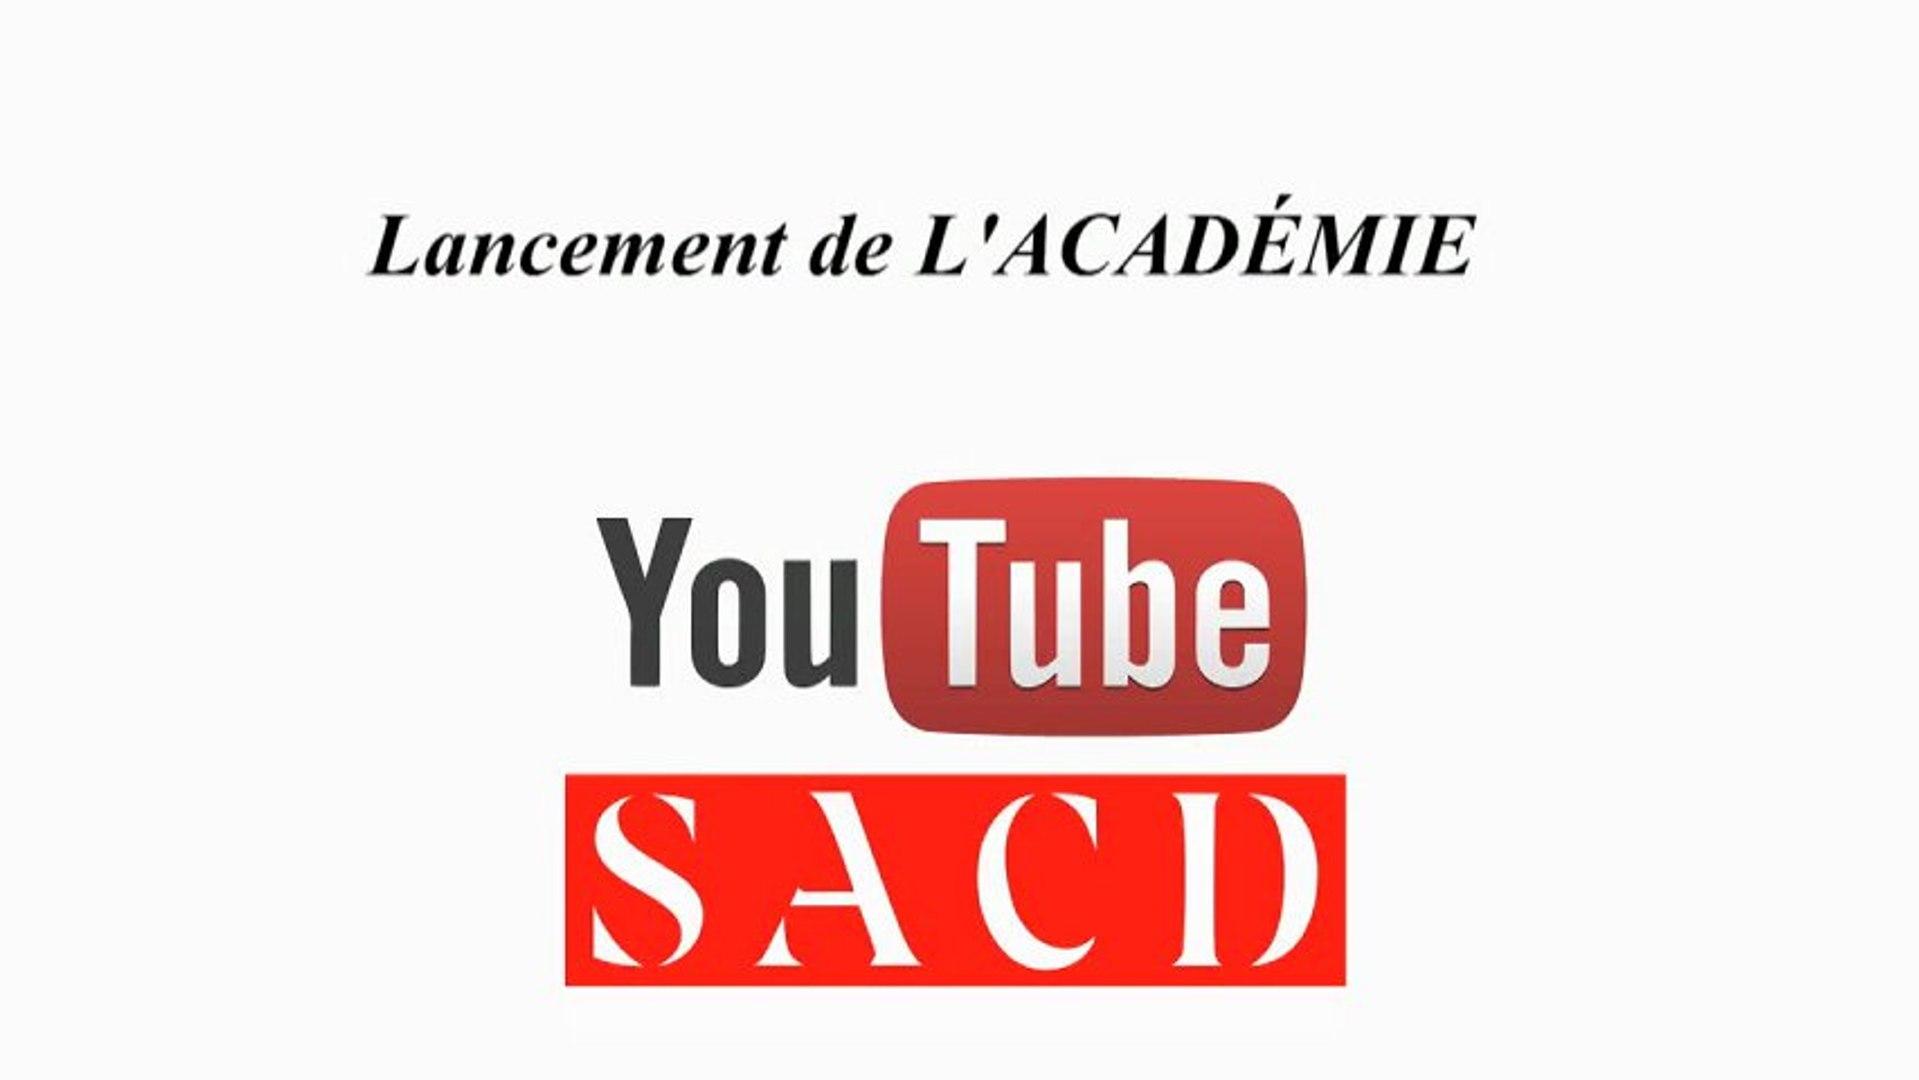 Blog226 à la recontre de l'académie Youtube SACD